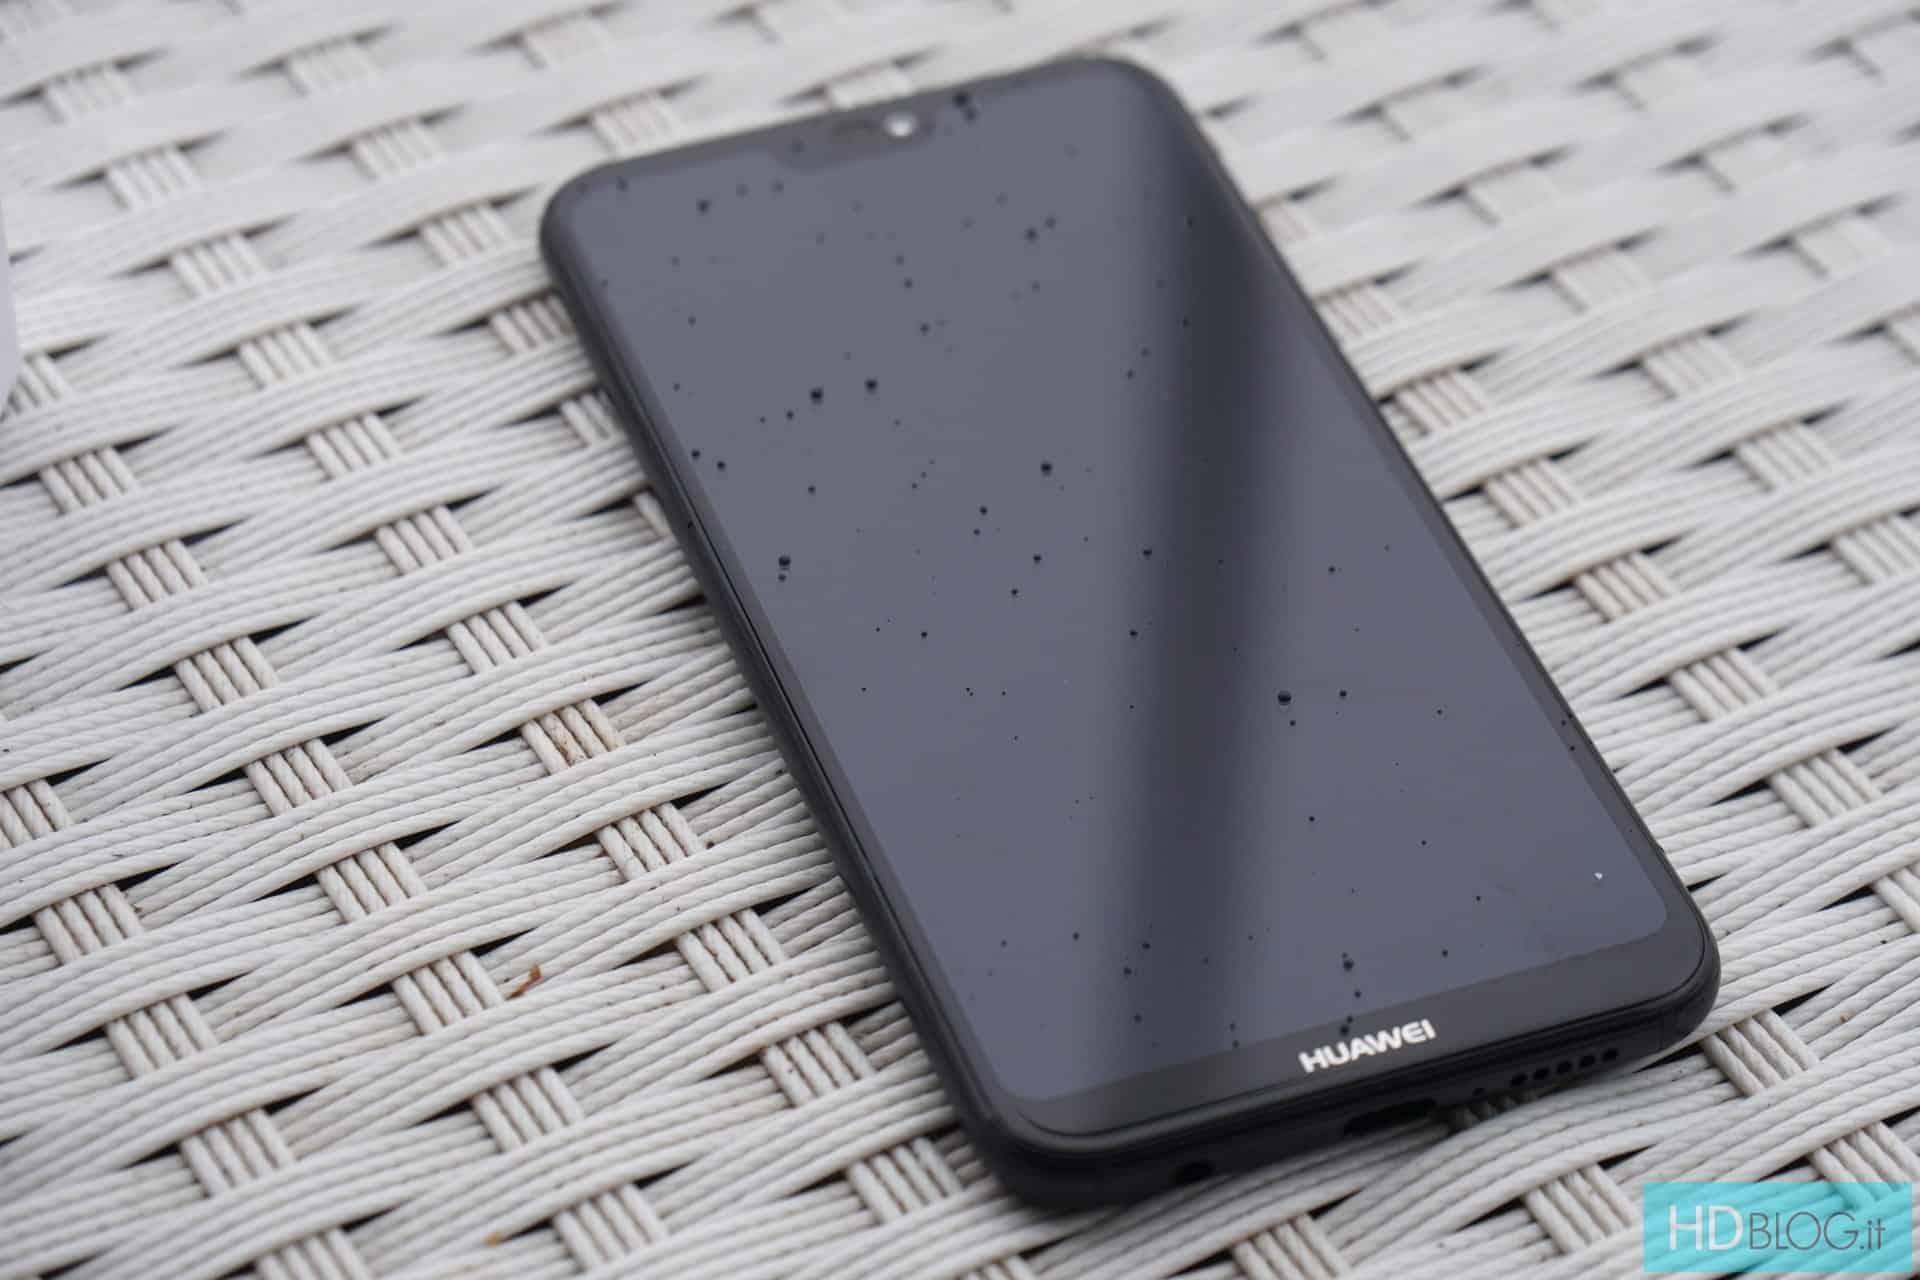 Huawei P20 Lite HDBlog image prelaunch 11